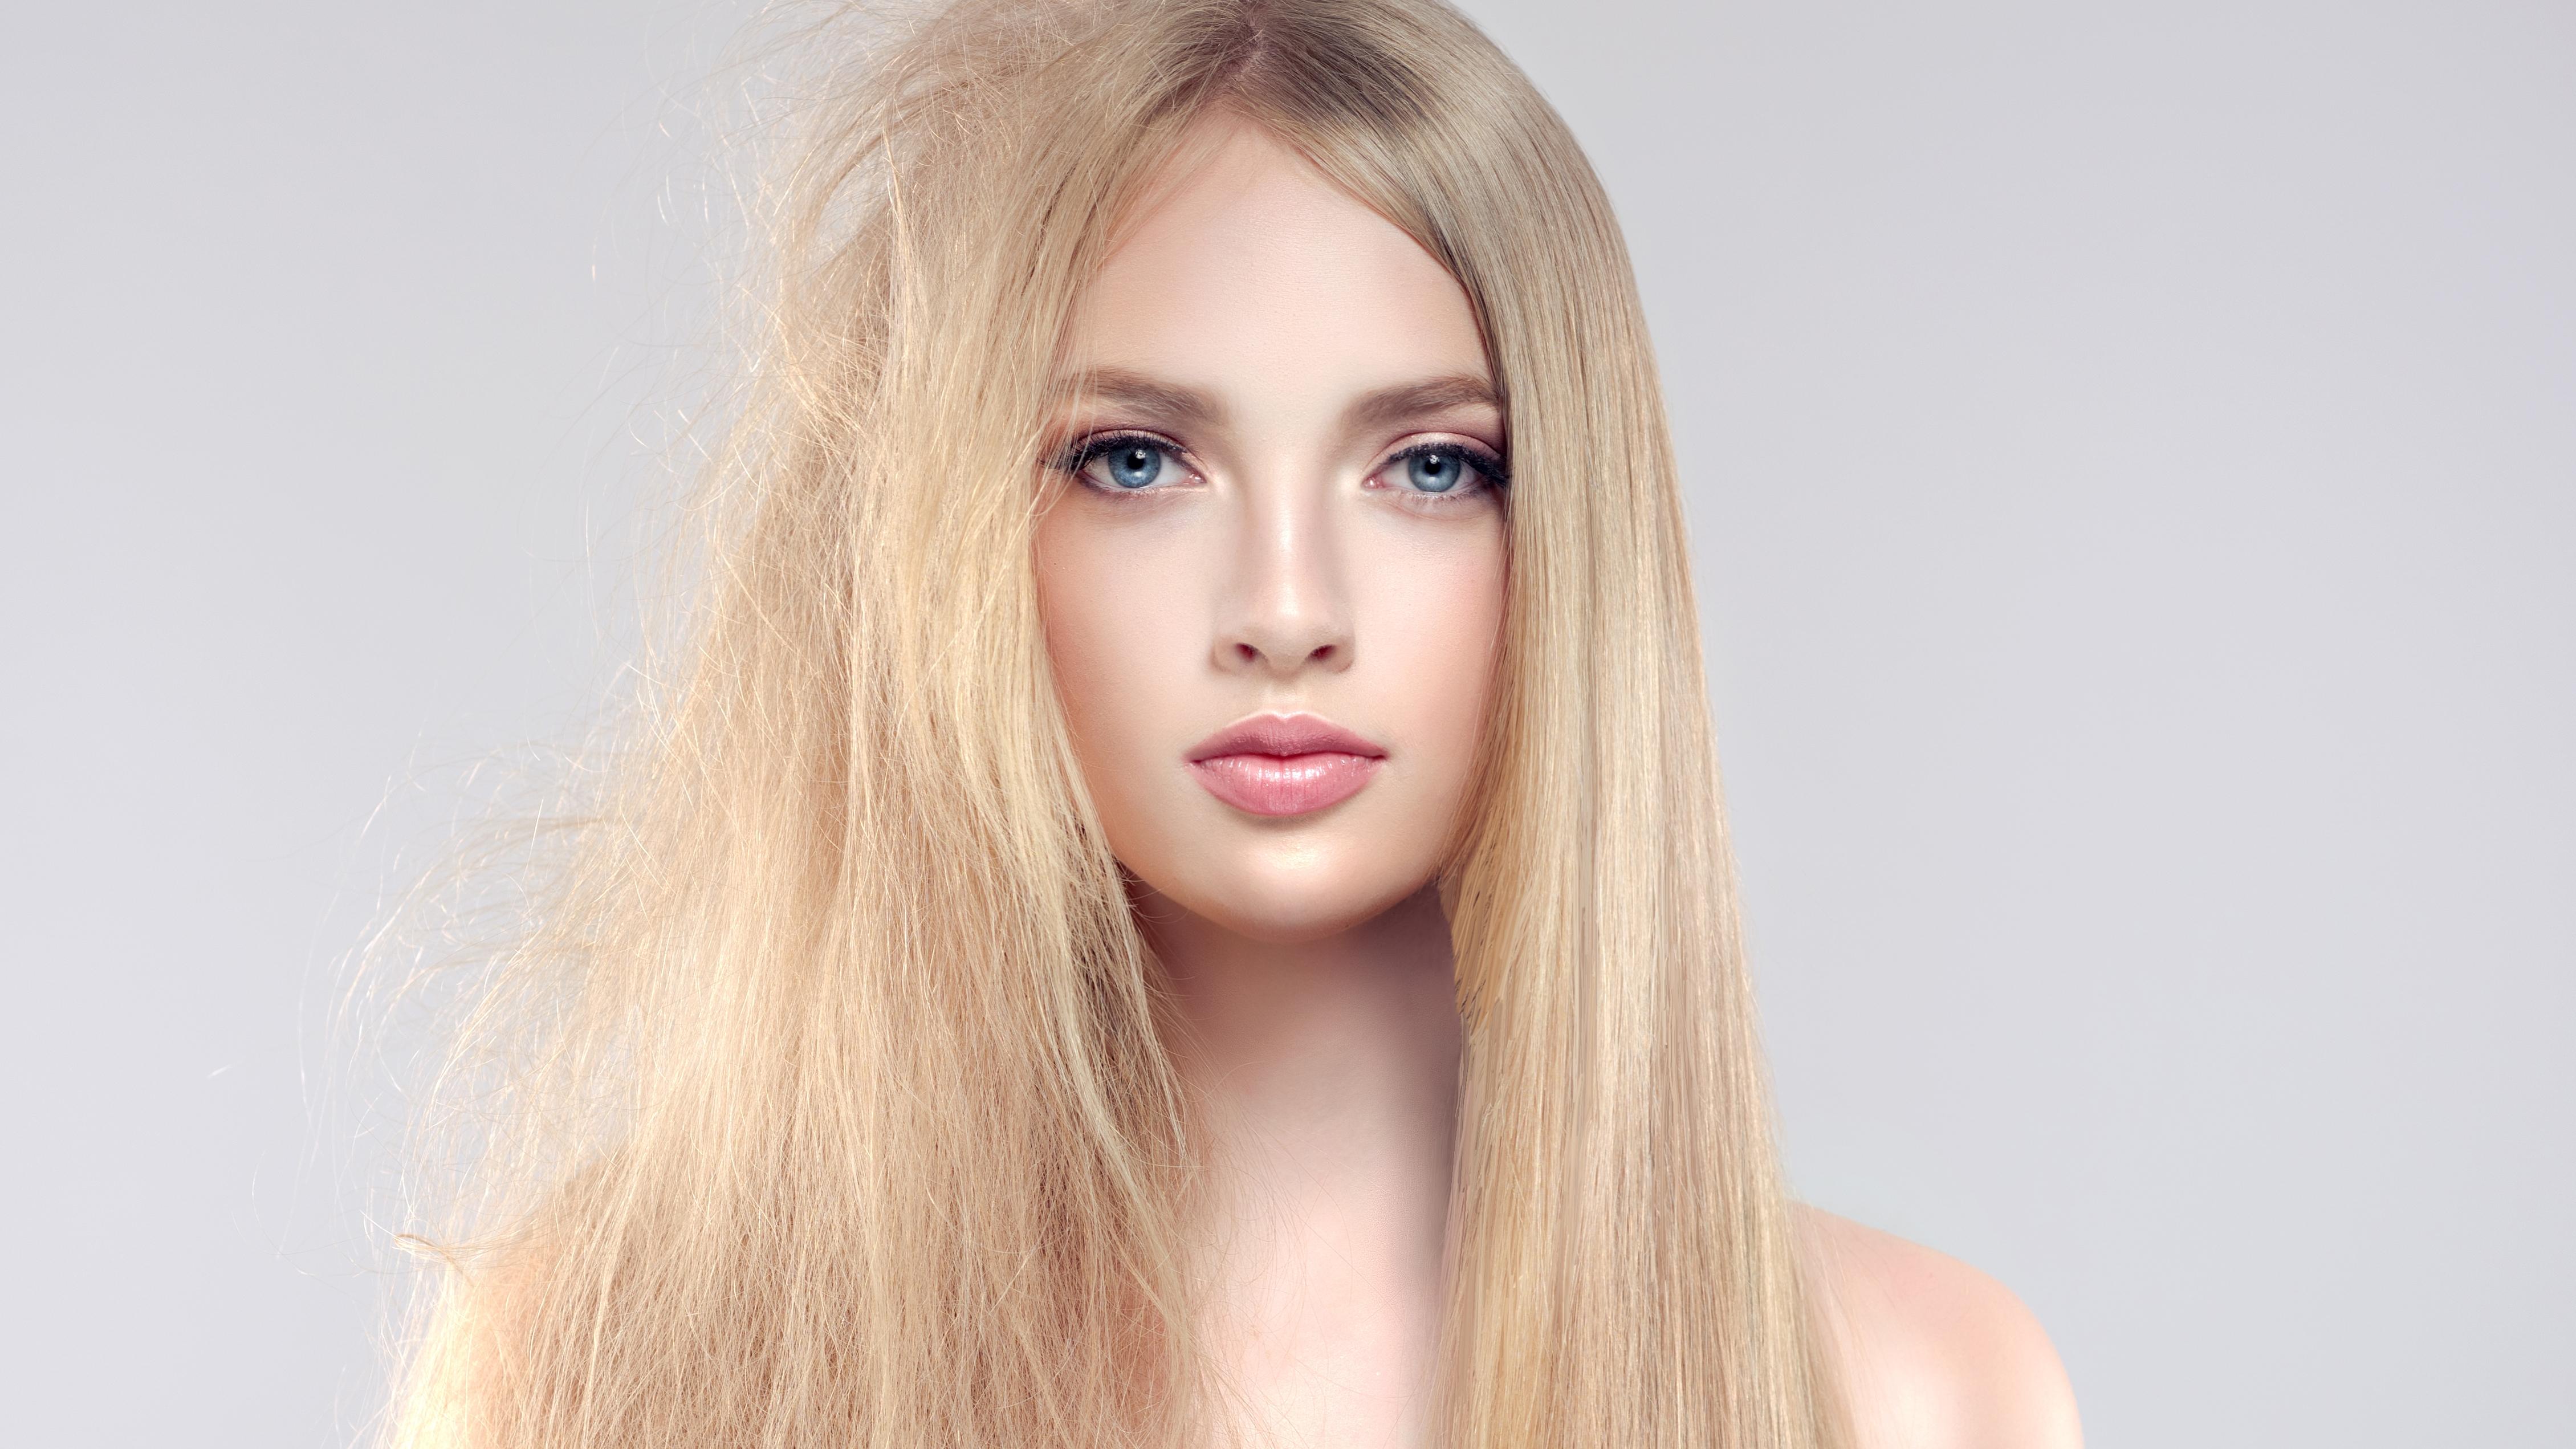 blond-frizz-keratin-treatment-hair-4-inpixio.jpg